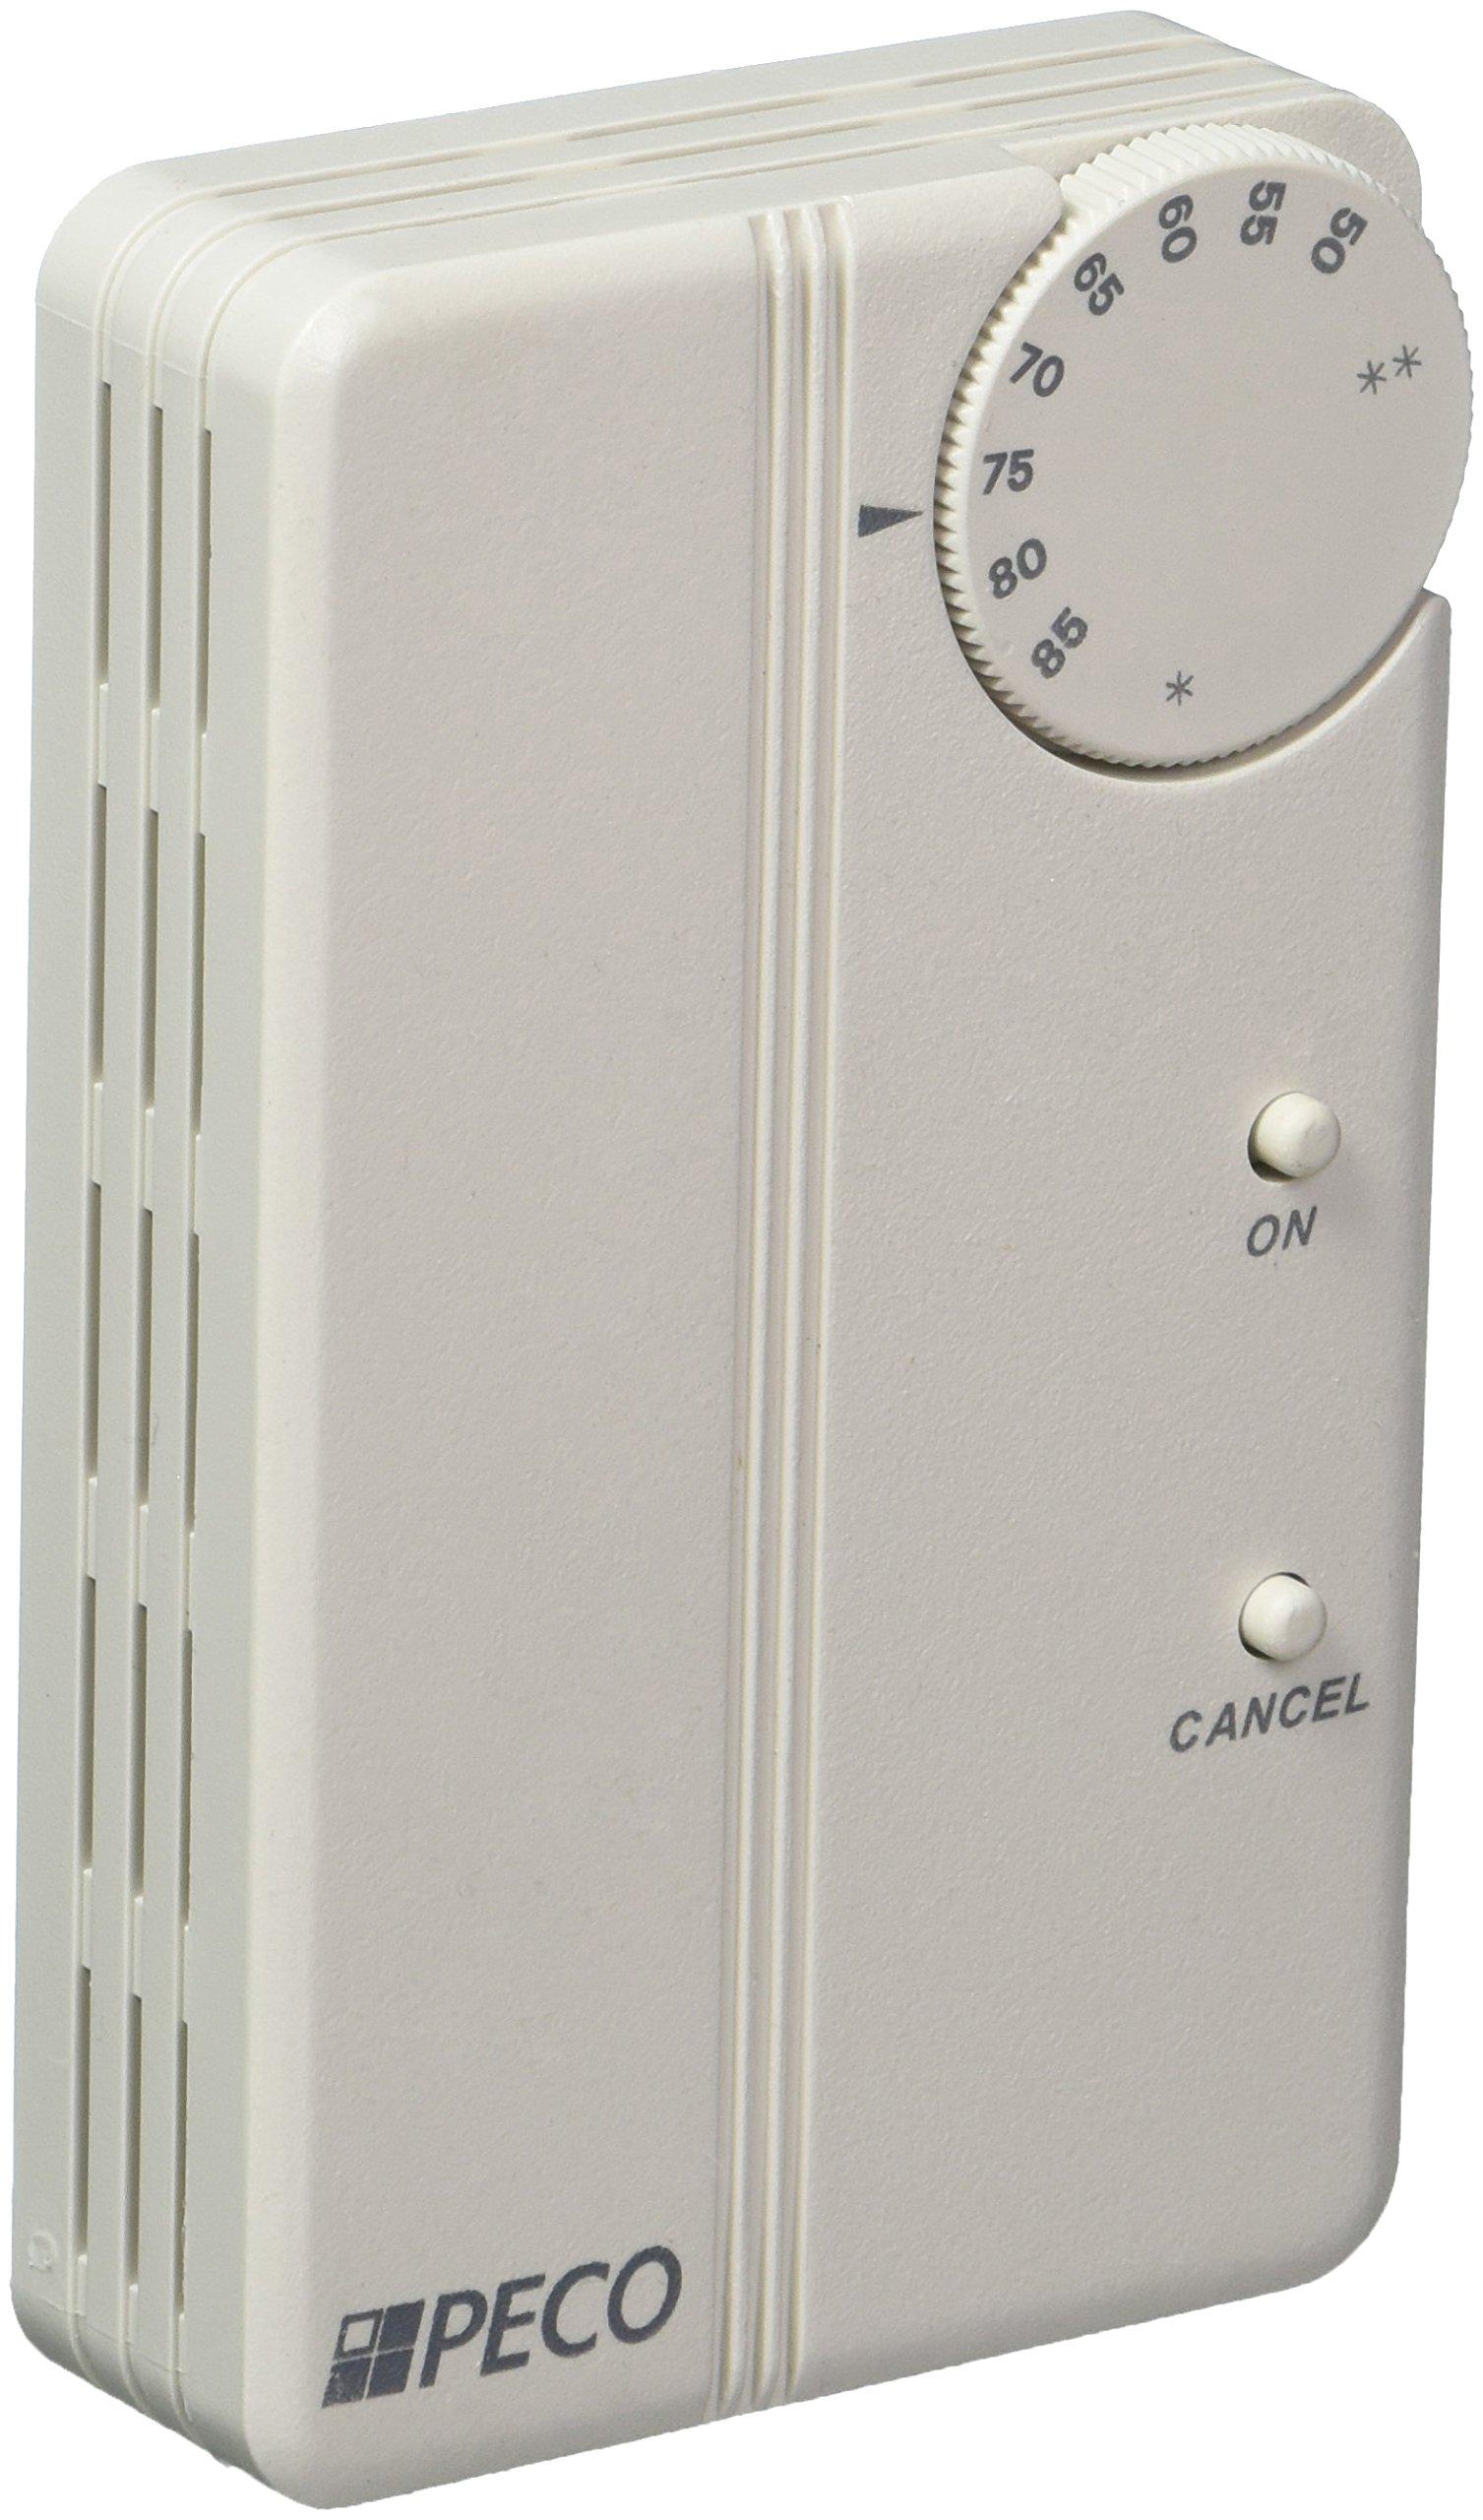 Peco SP155-027 Trane Compatible Zone Sensor, White by PECO (Image #1)